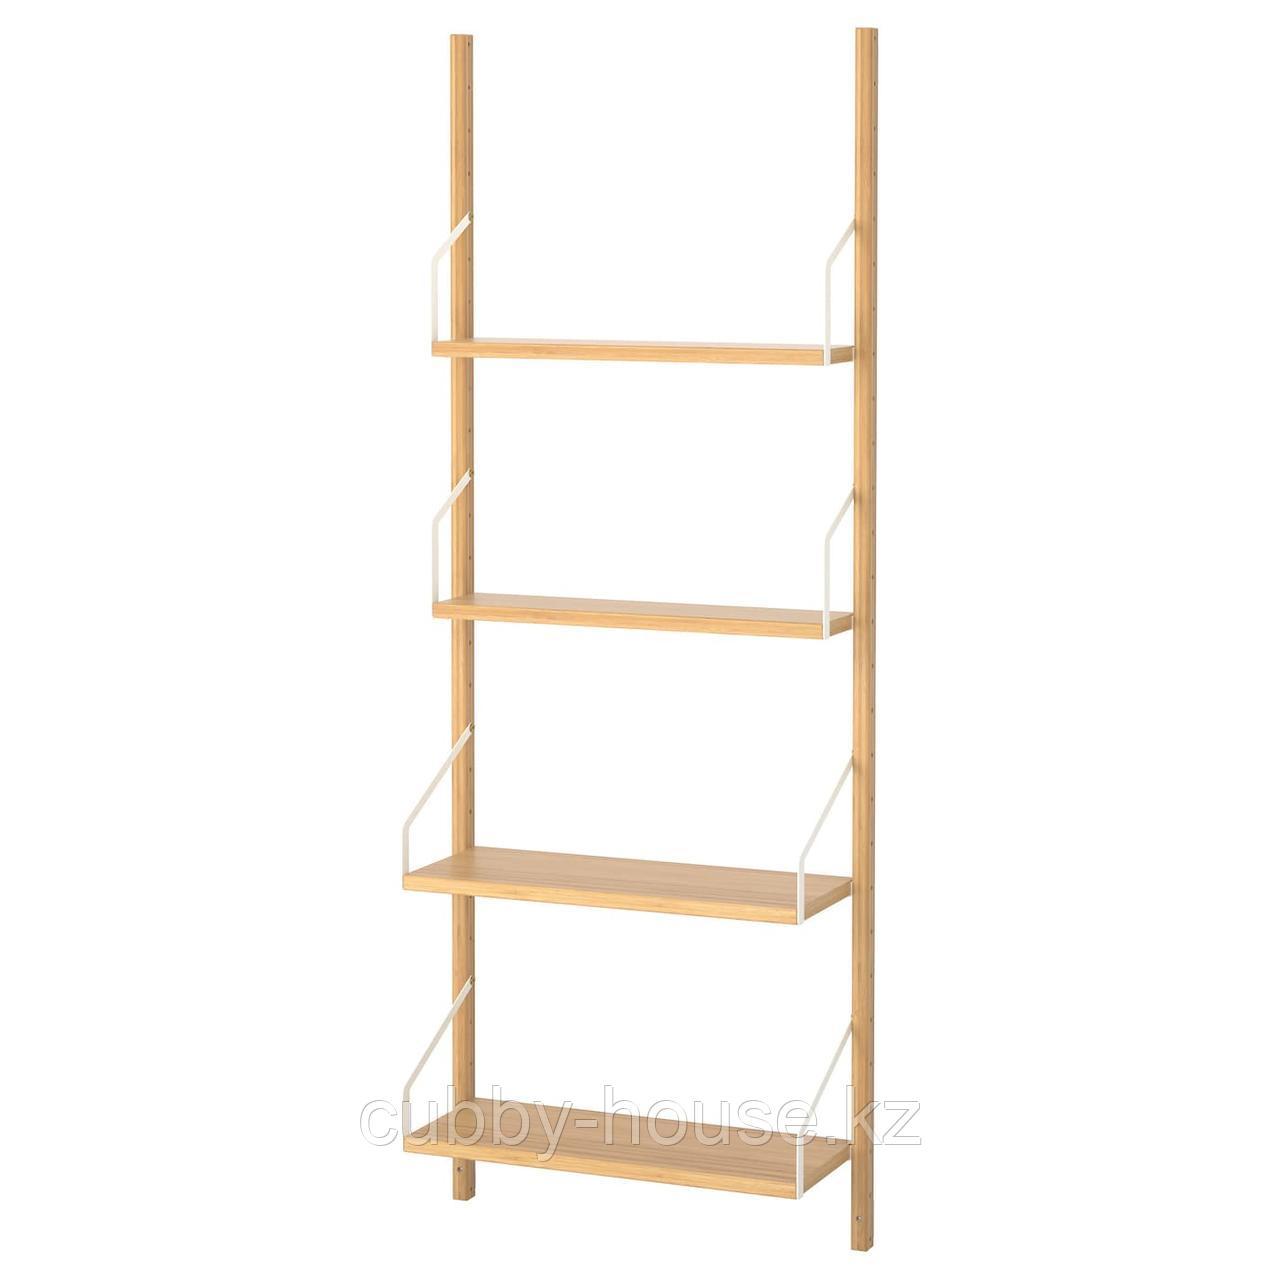 СВАЛЬНЭС Комбинация полок, бамбук, 66x25x176 см